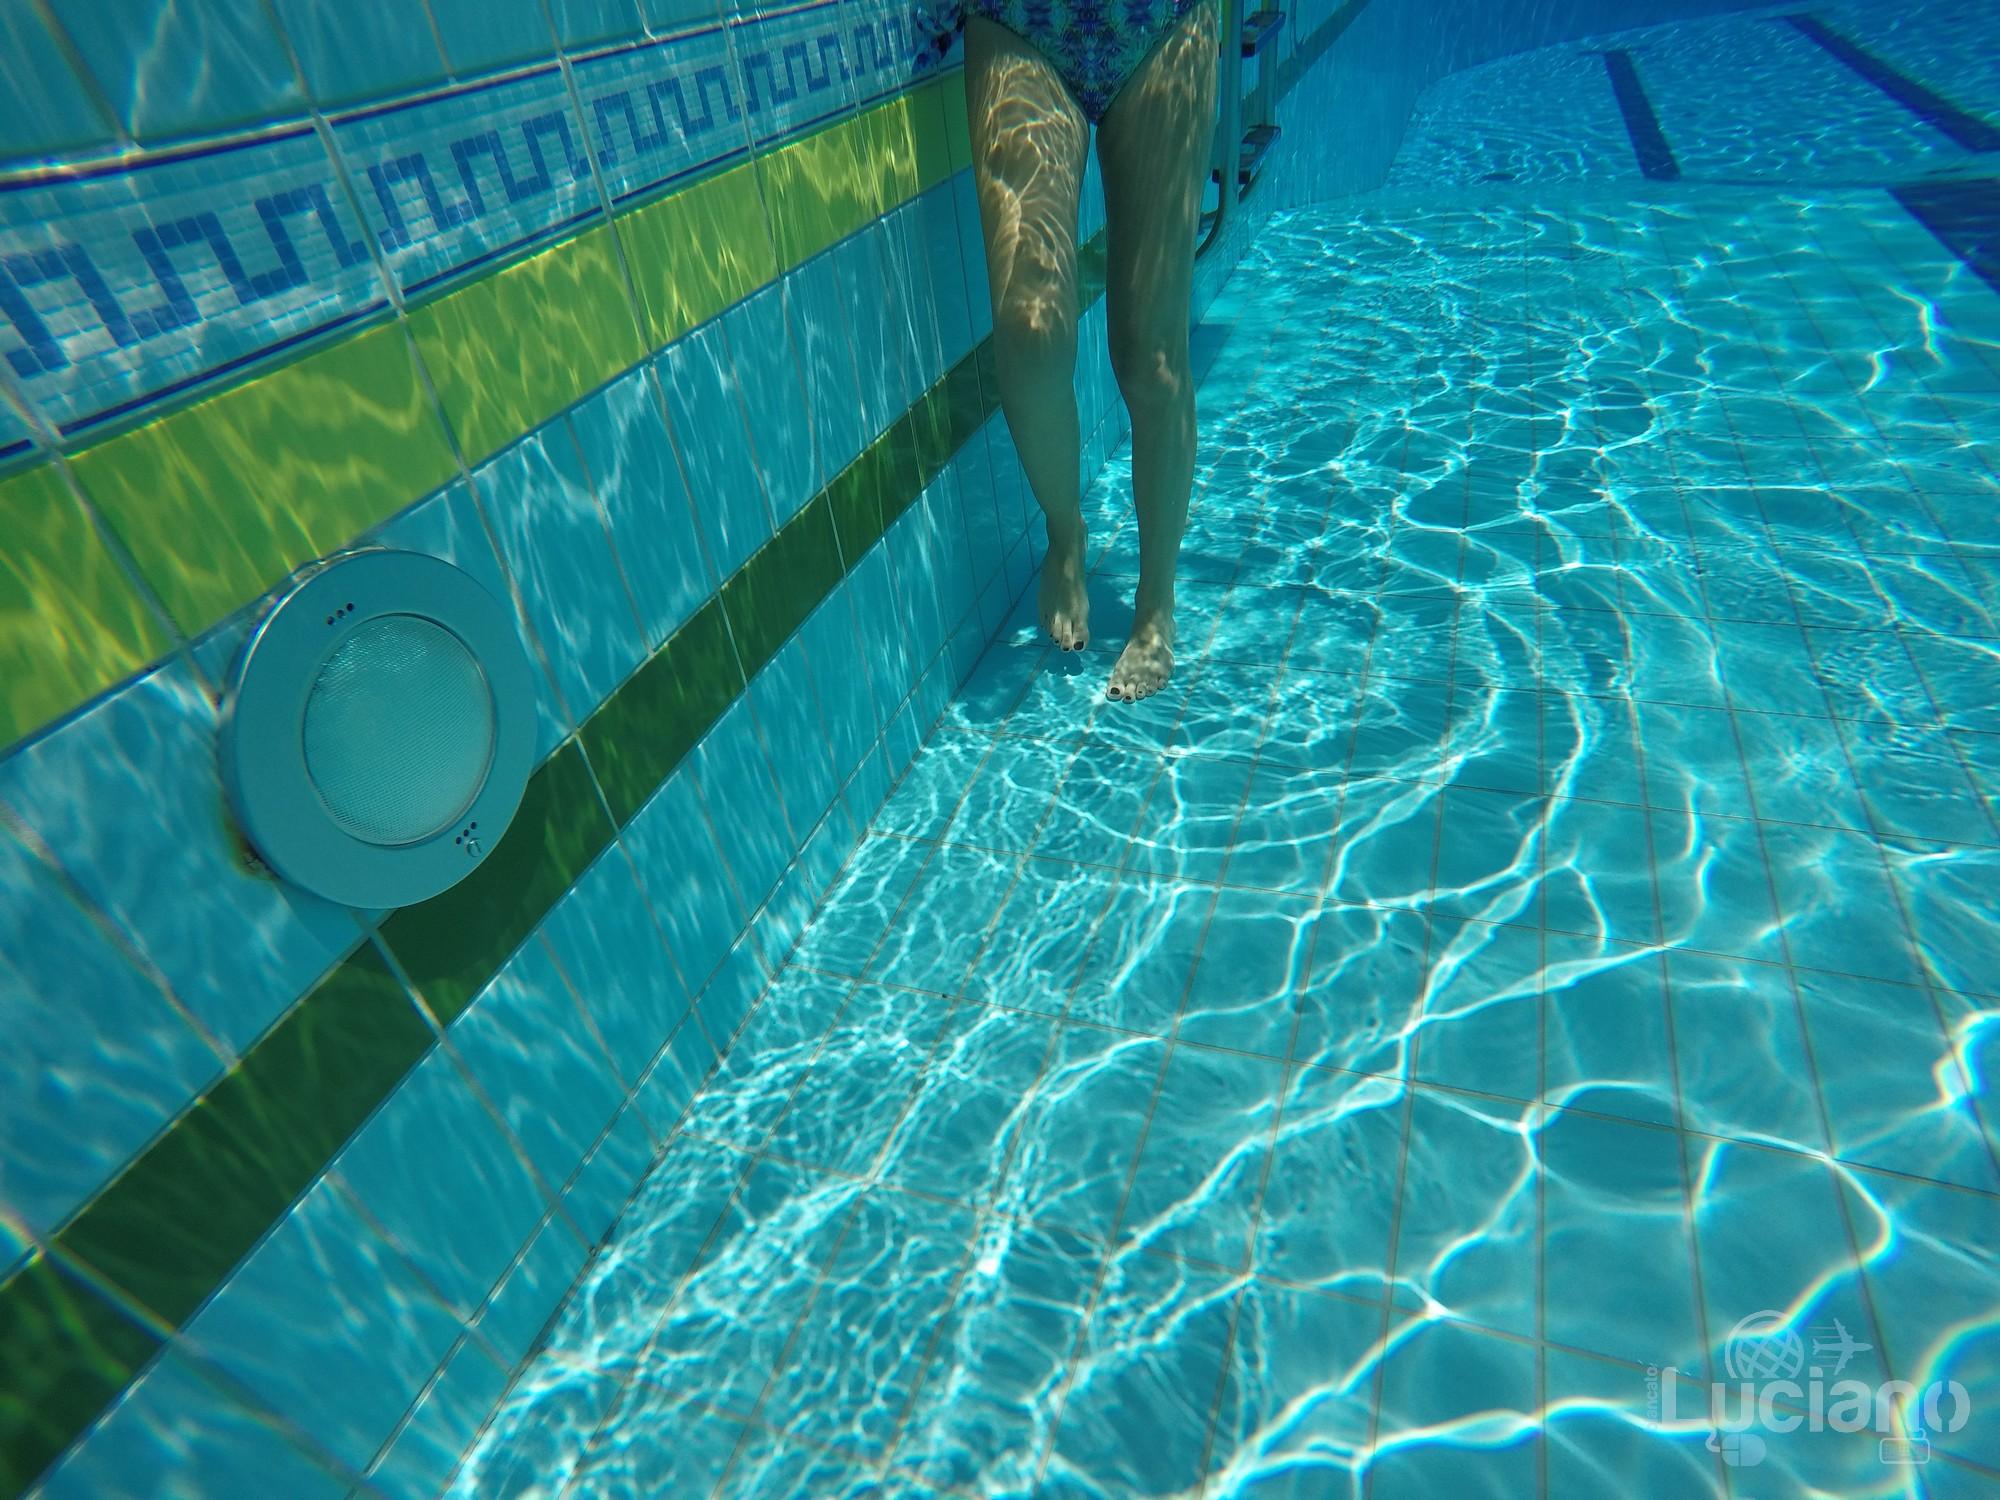 Grand Hotel - Minareto - piscina olimpionica - interno piscina